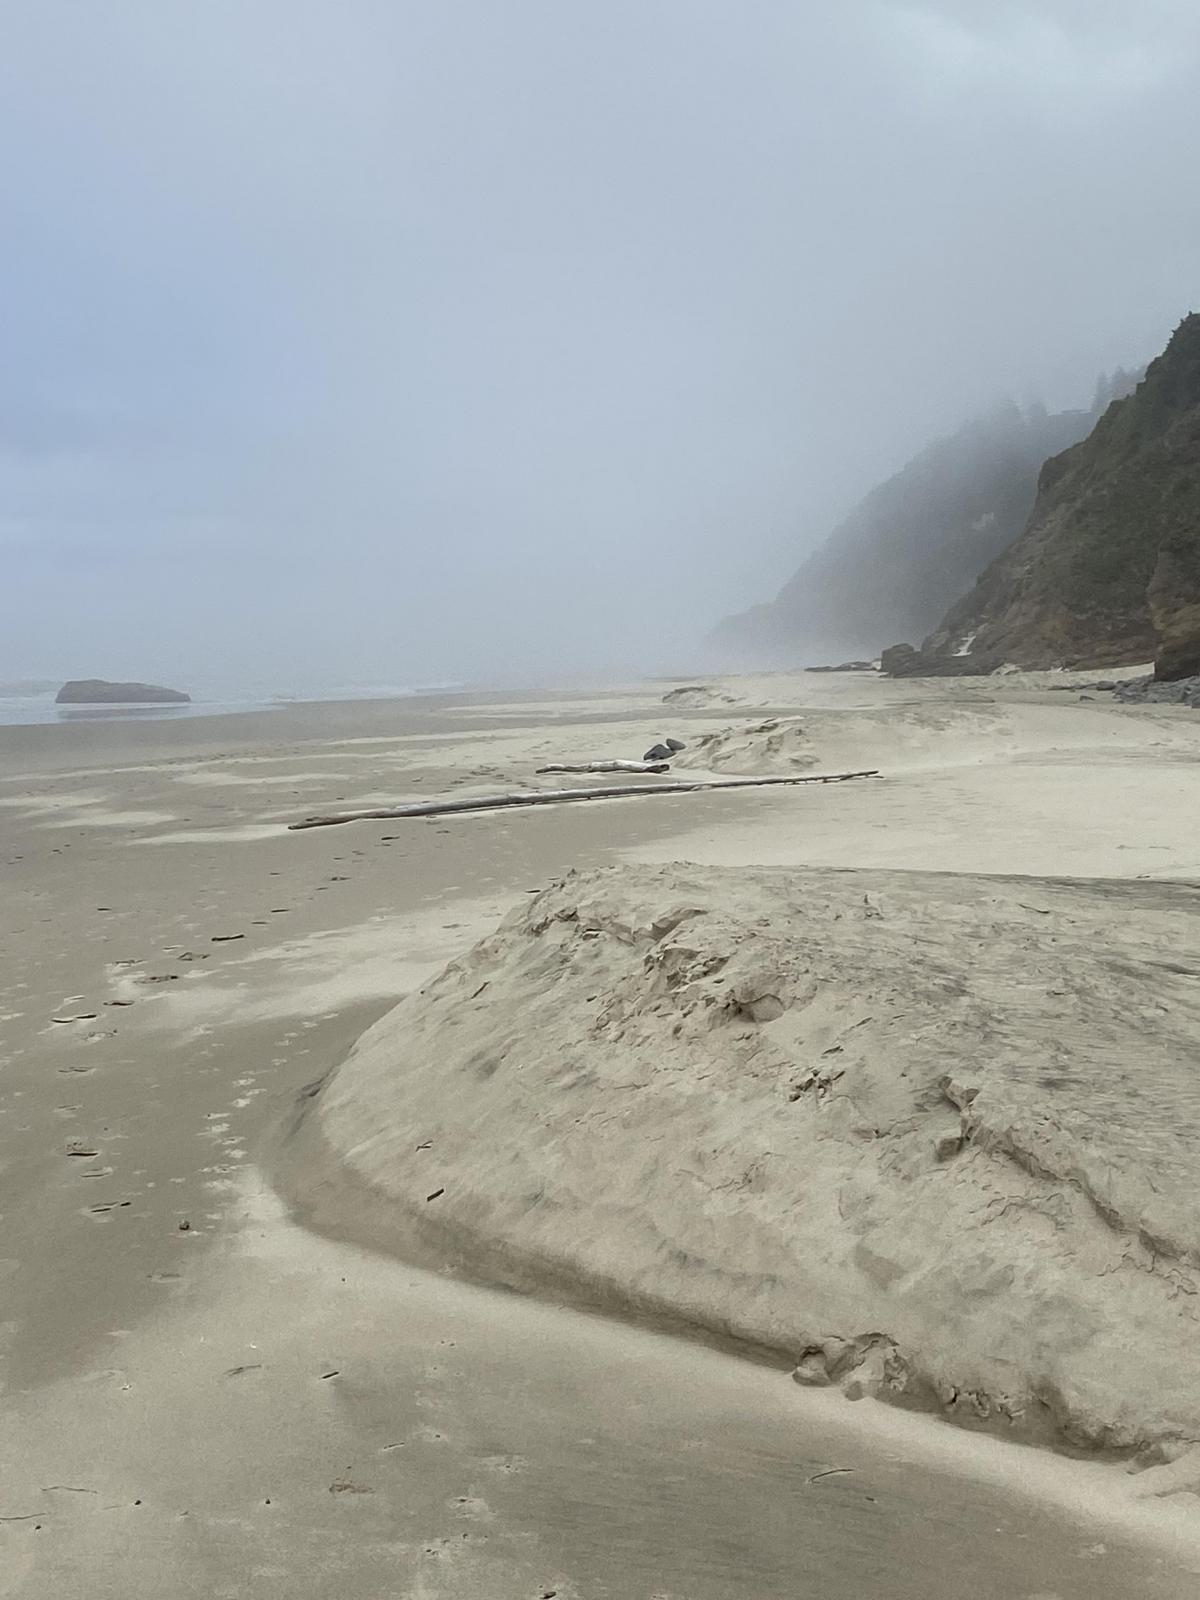 Dunes present on beach